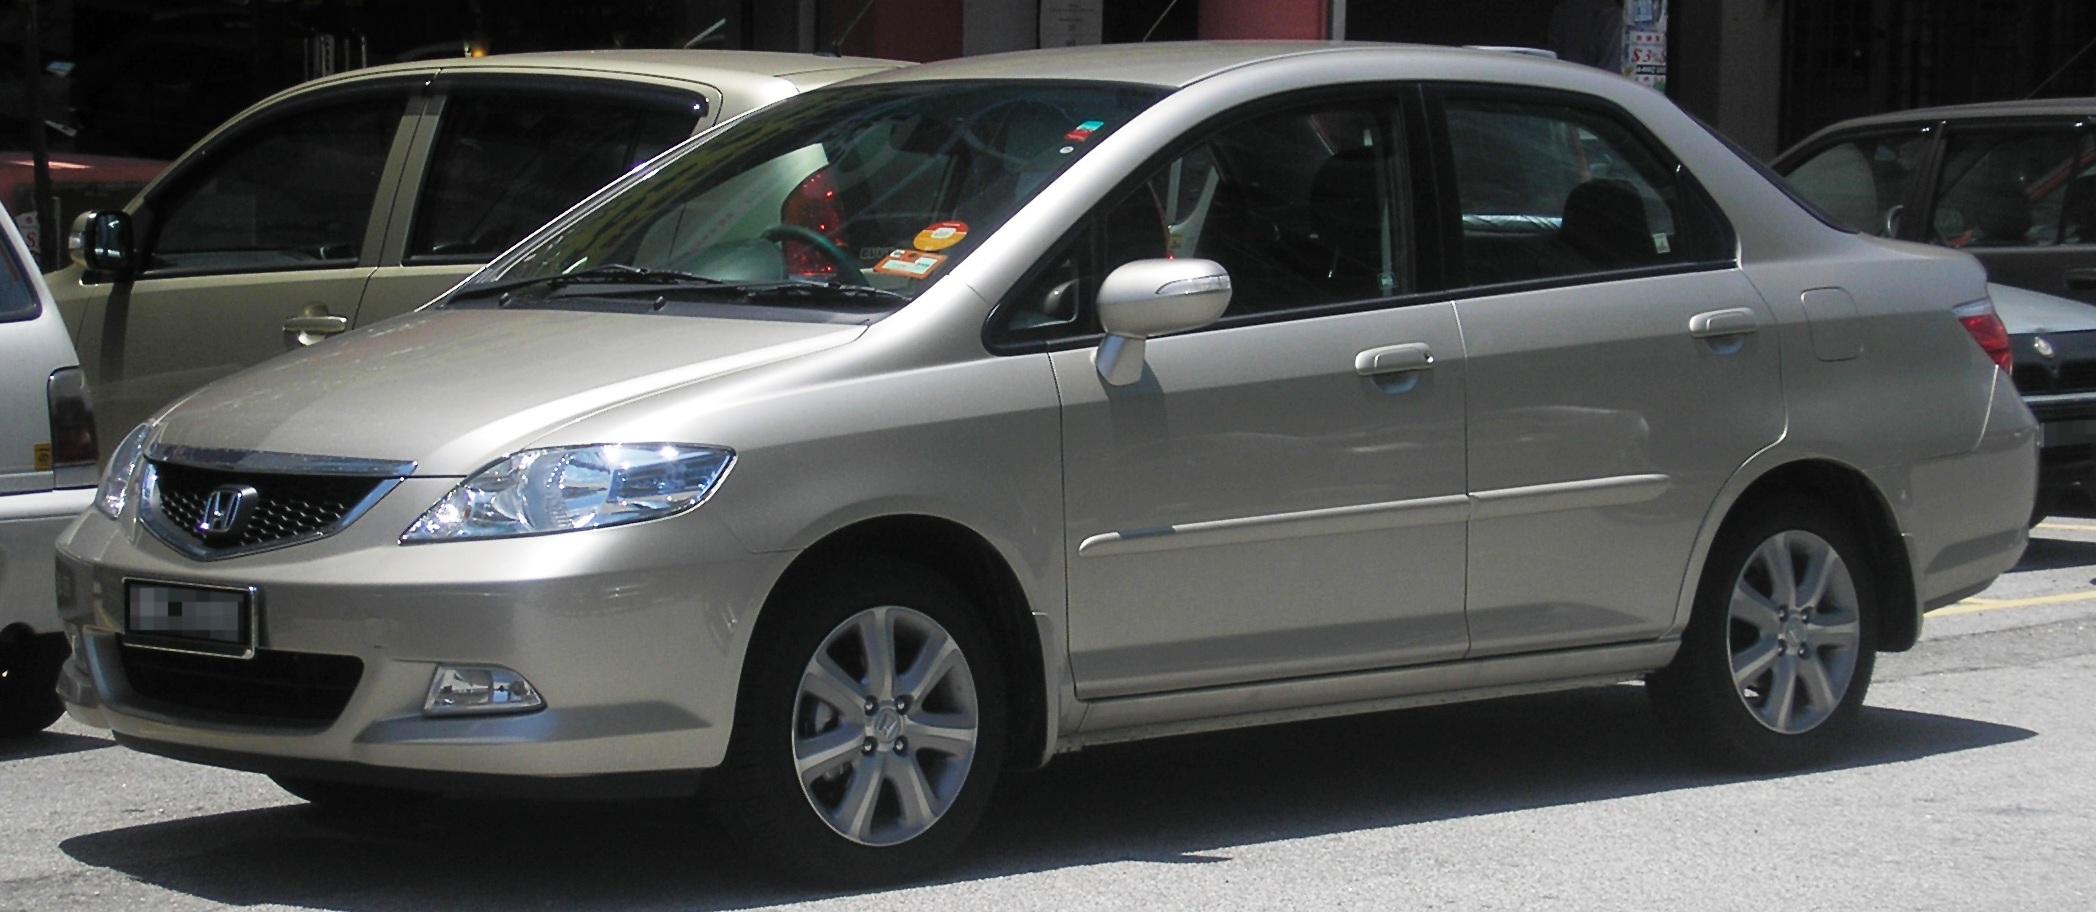 2008 Honda City - Partsopen